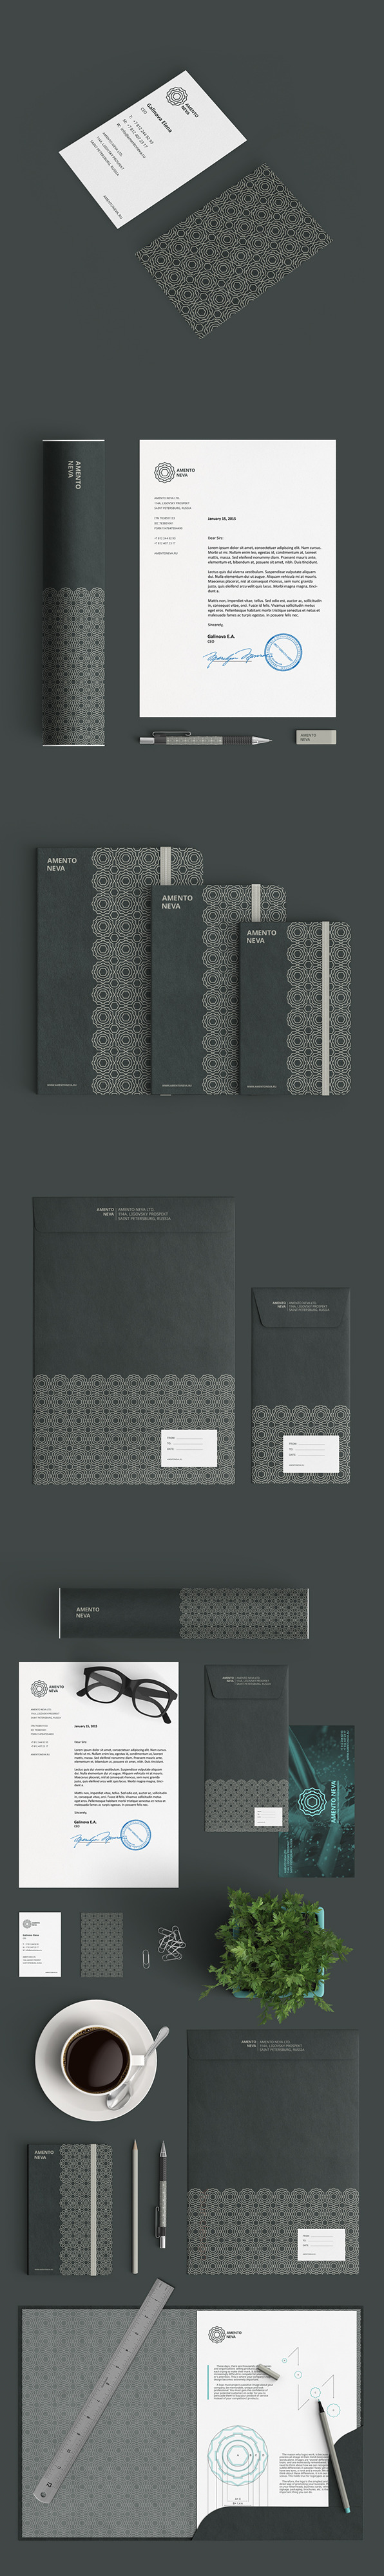 Amento Neva - Branding